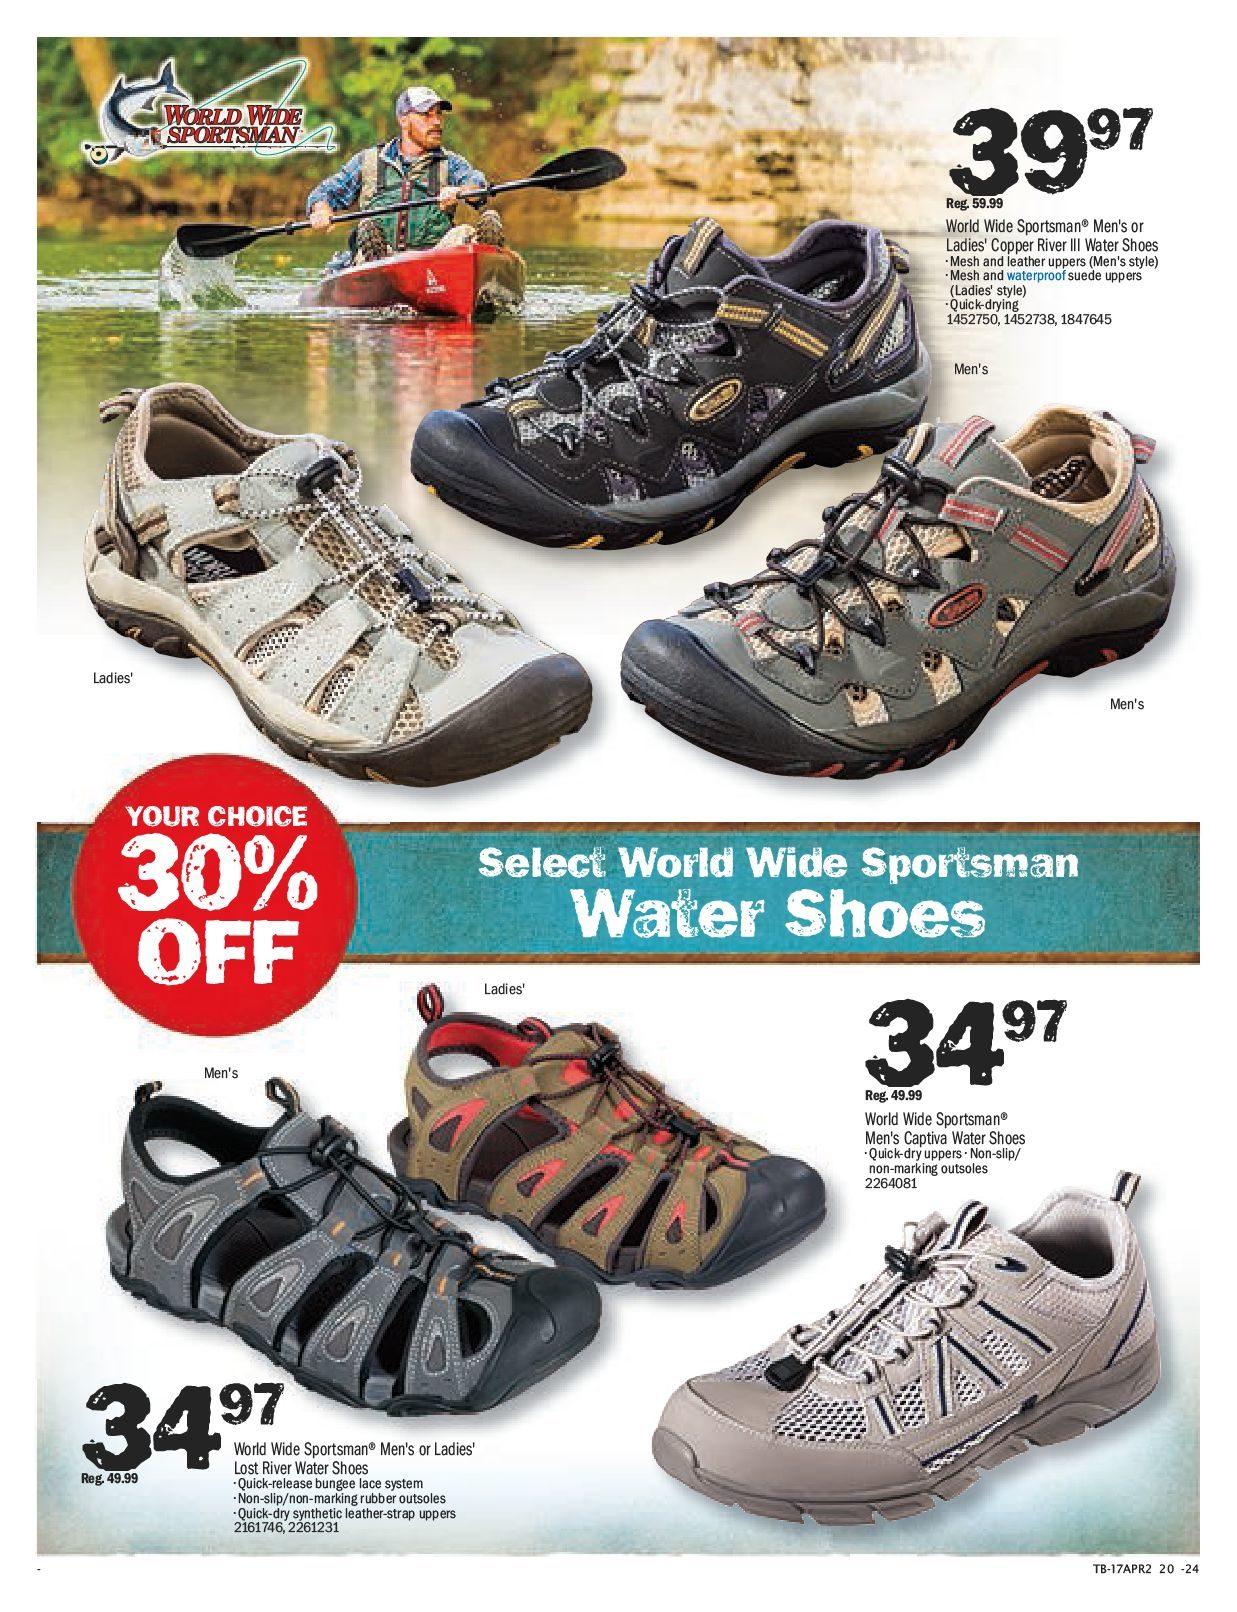 686b6ac112d1f Bass Pro Shops Weekly Flyer - Outdoor Escape Sale - Apr 14 – 30 -  RedFlagDeals.com